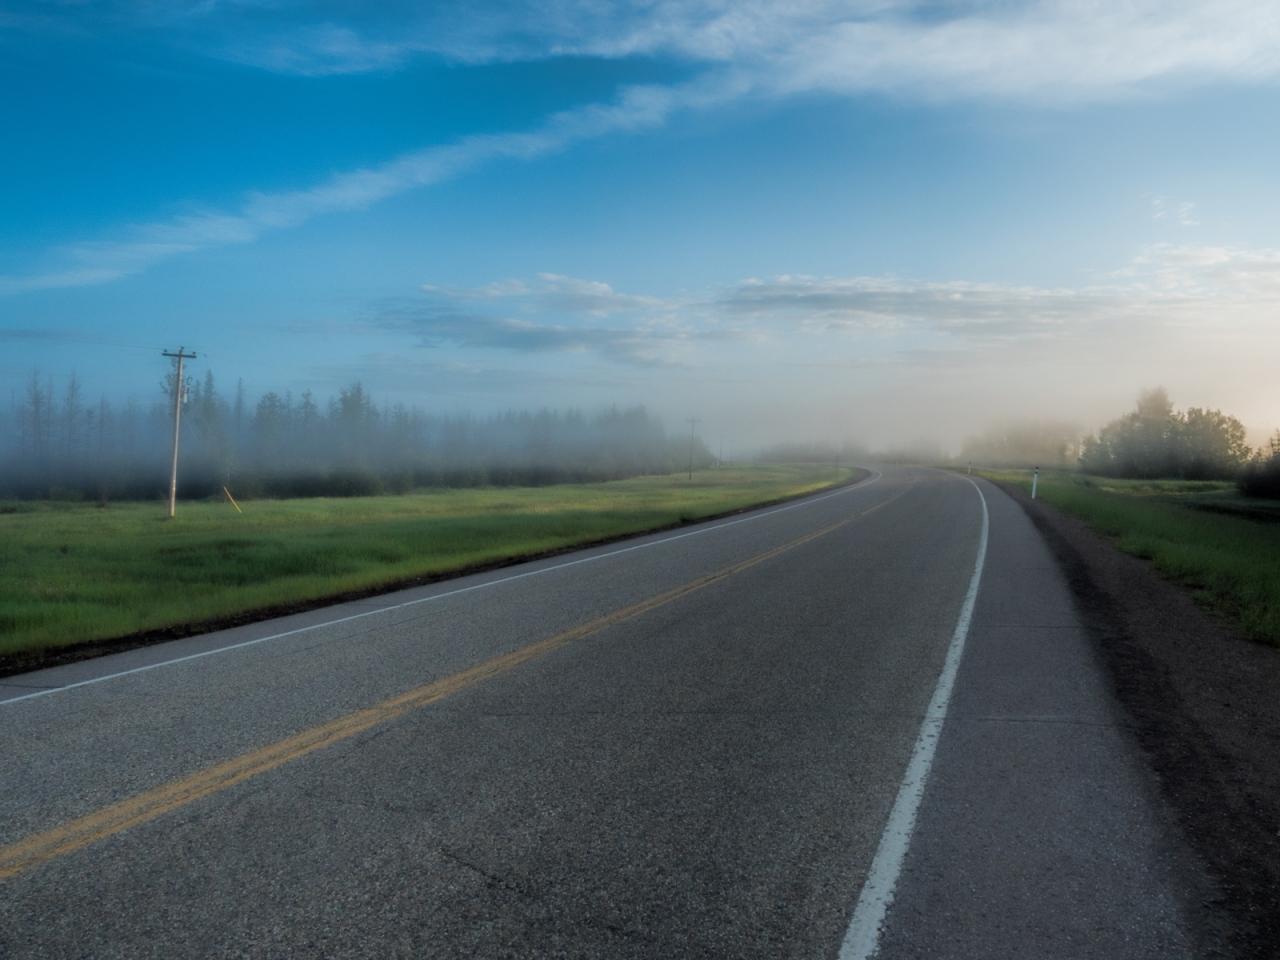 Morning Images - High Level, Alberta - Canada 10